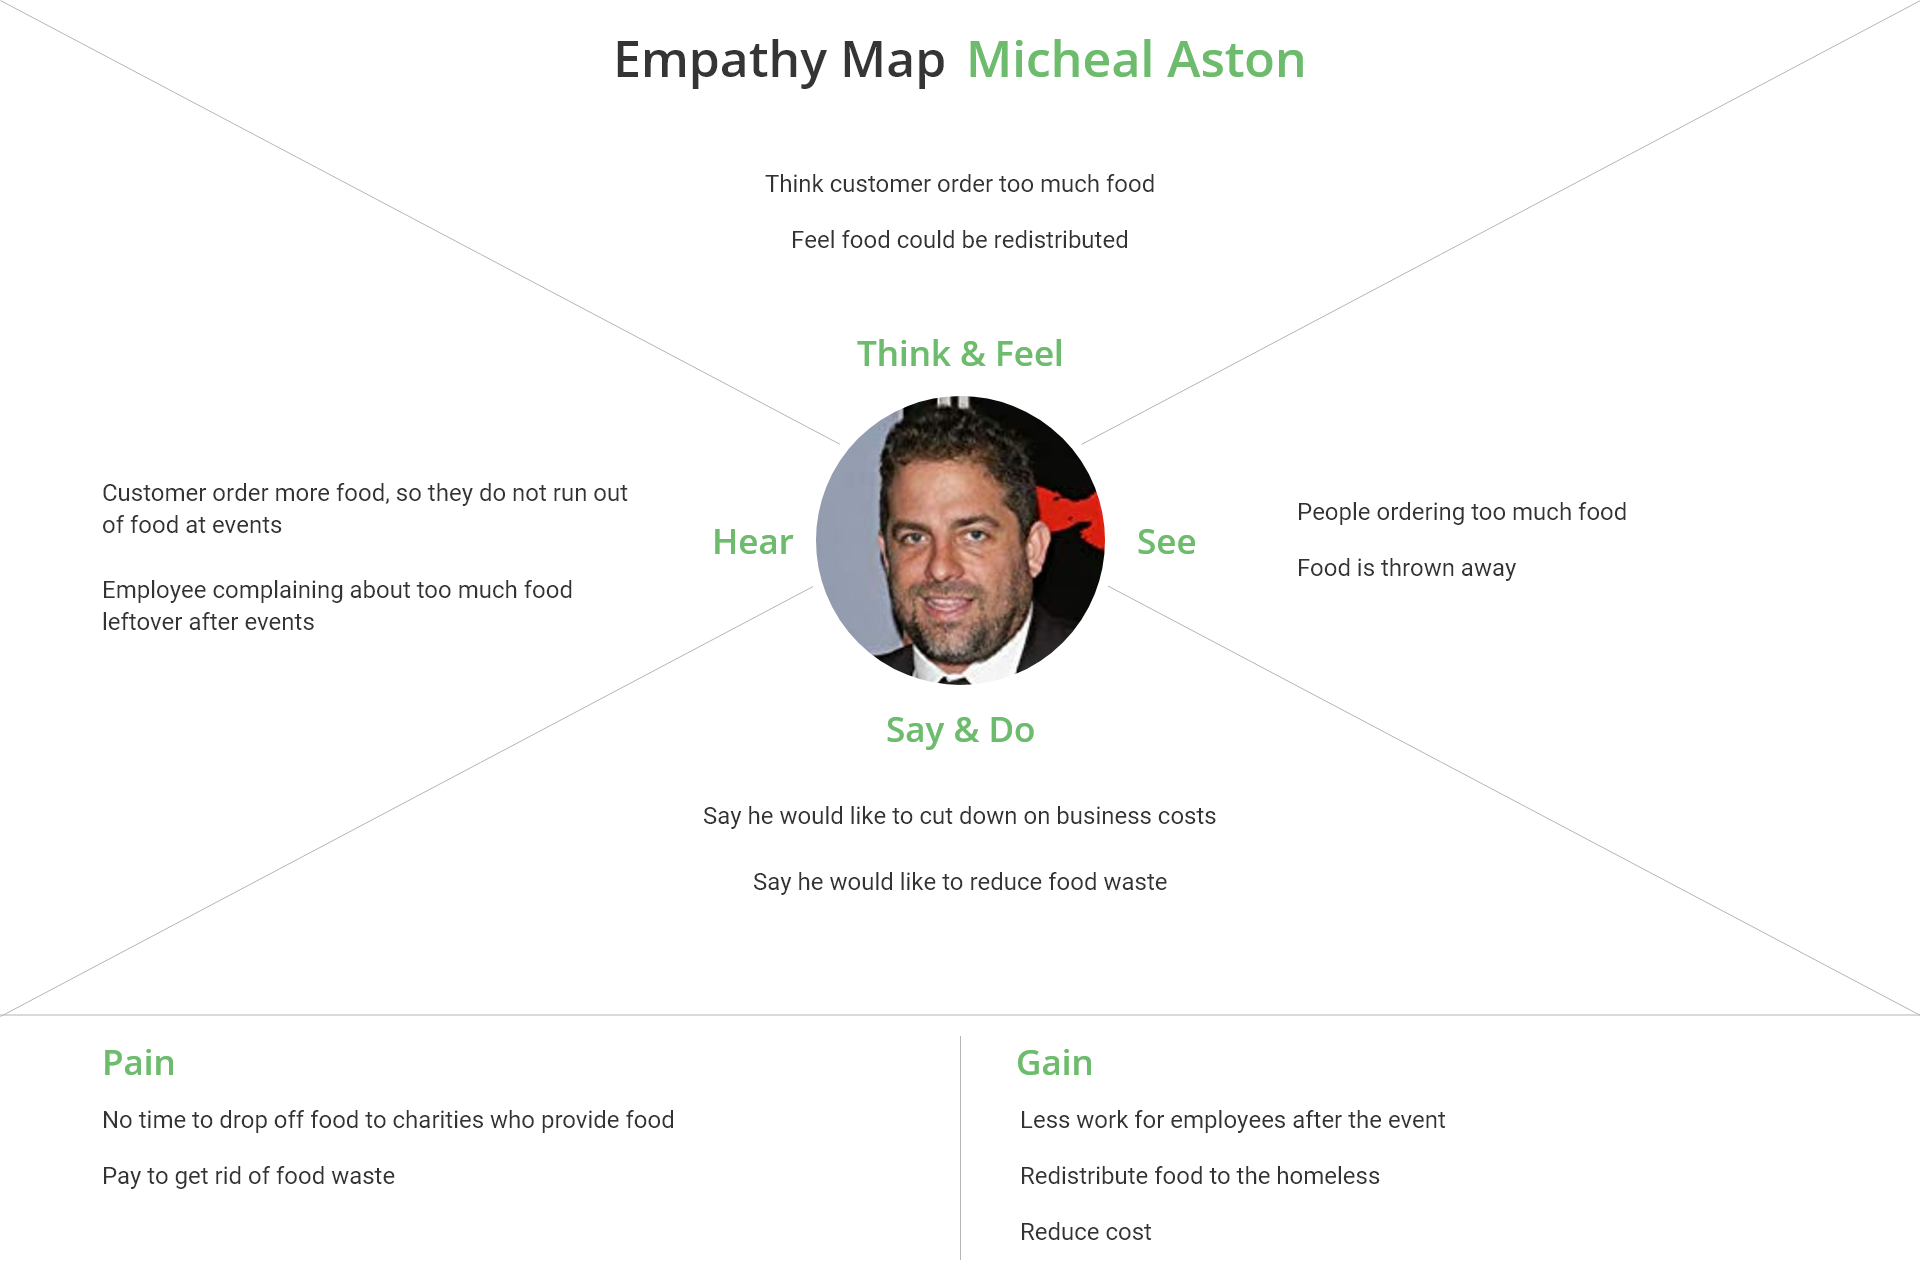 emphathy map Micheal Aston